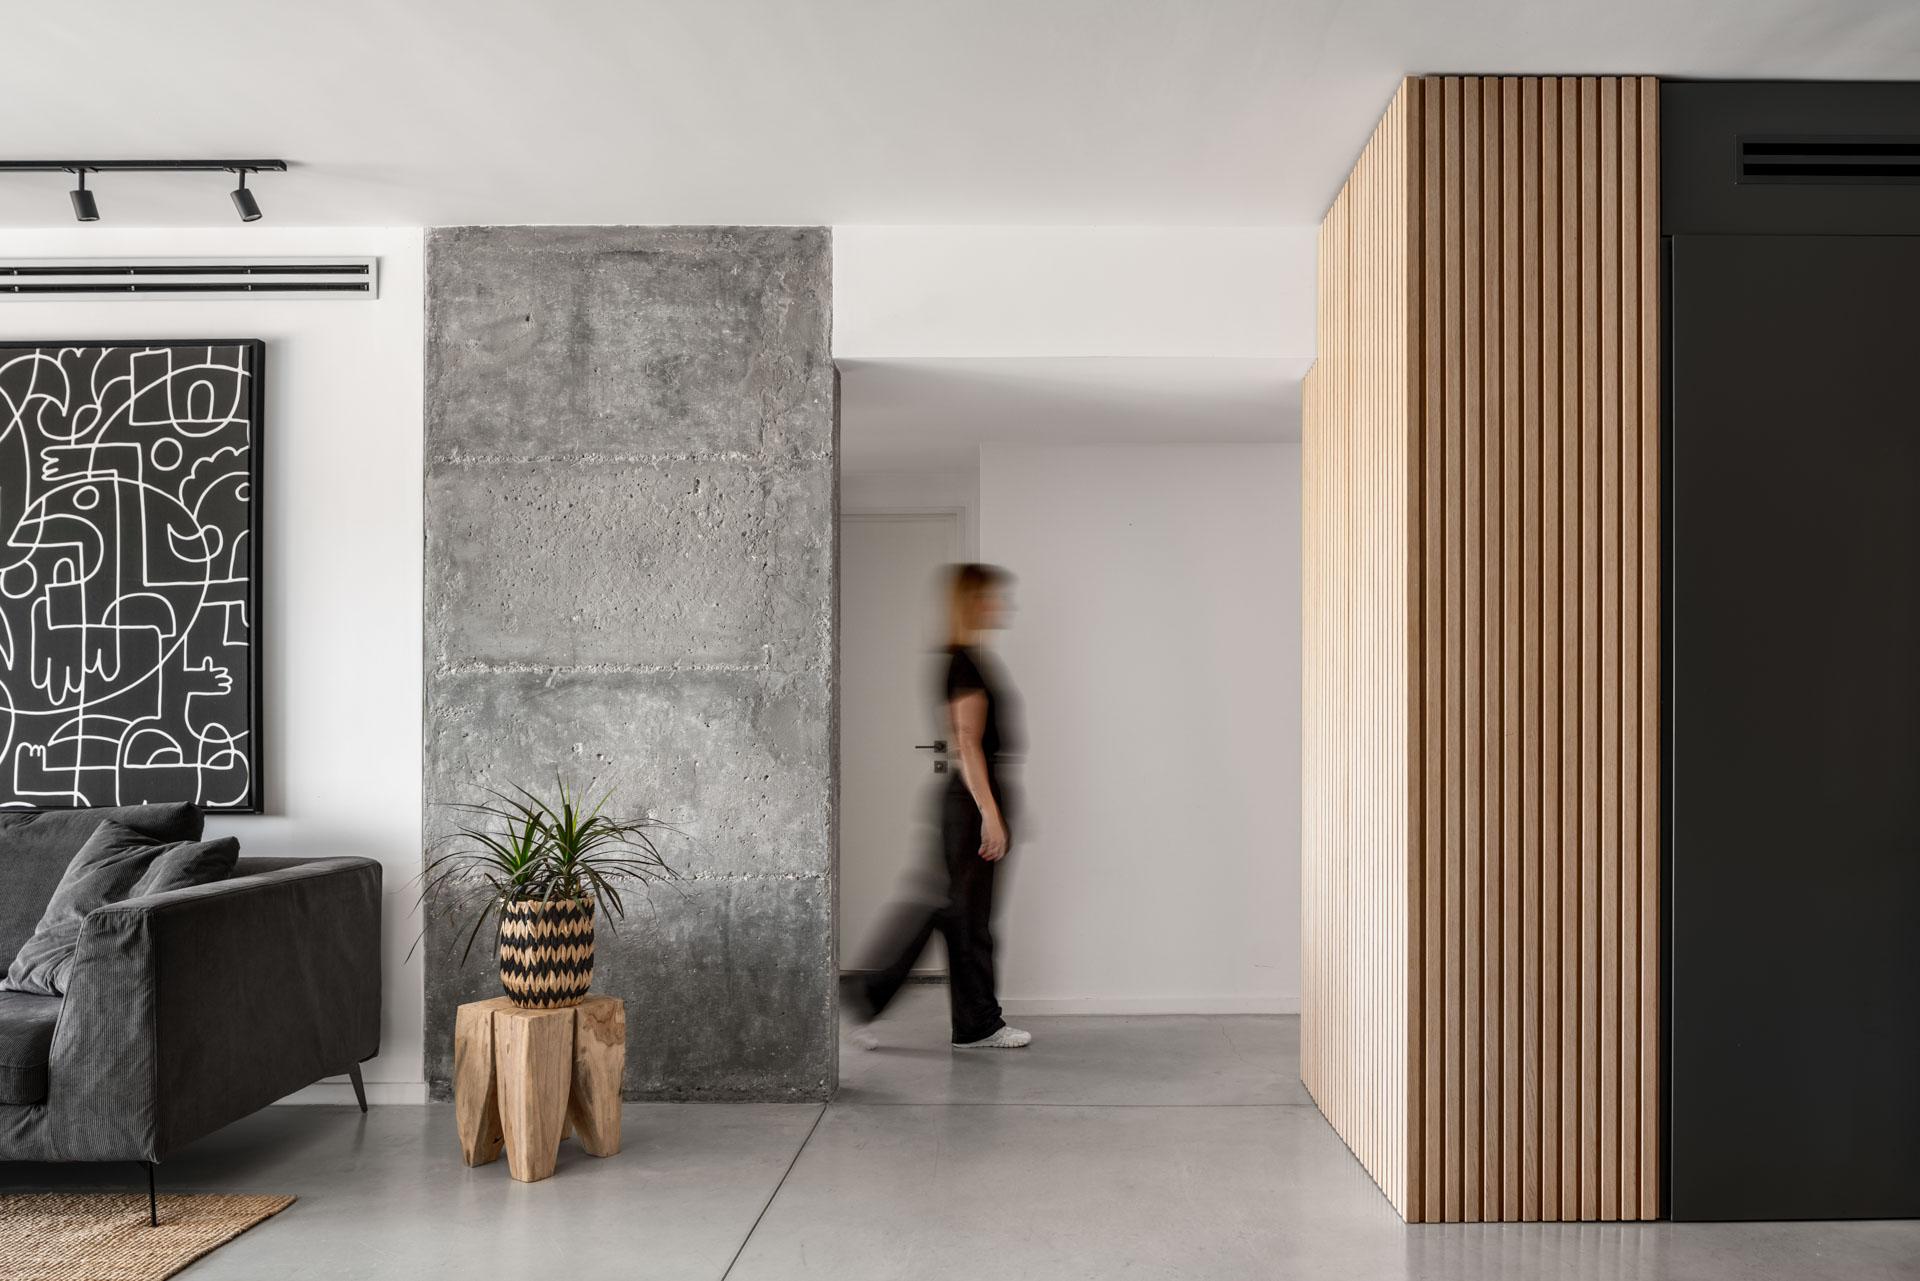 Peled-Studios-Two-Apartments_-207-HDR-copy-1